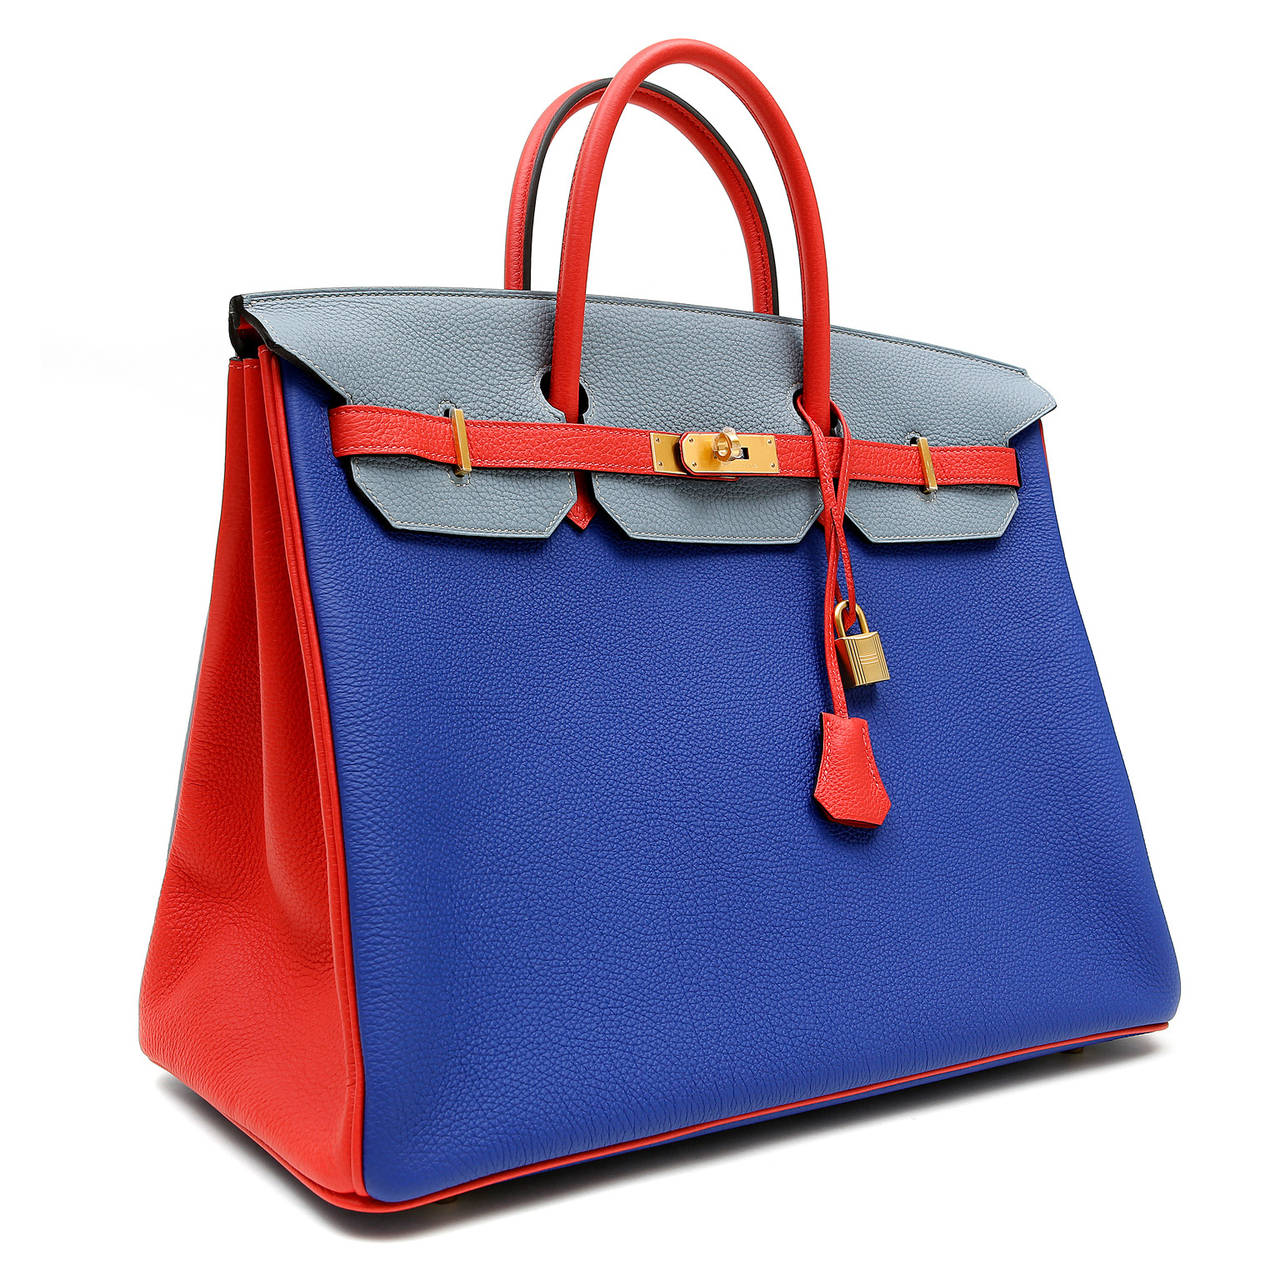 hermes bag colors